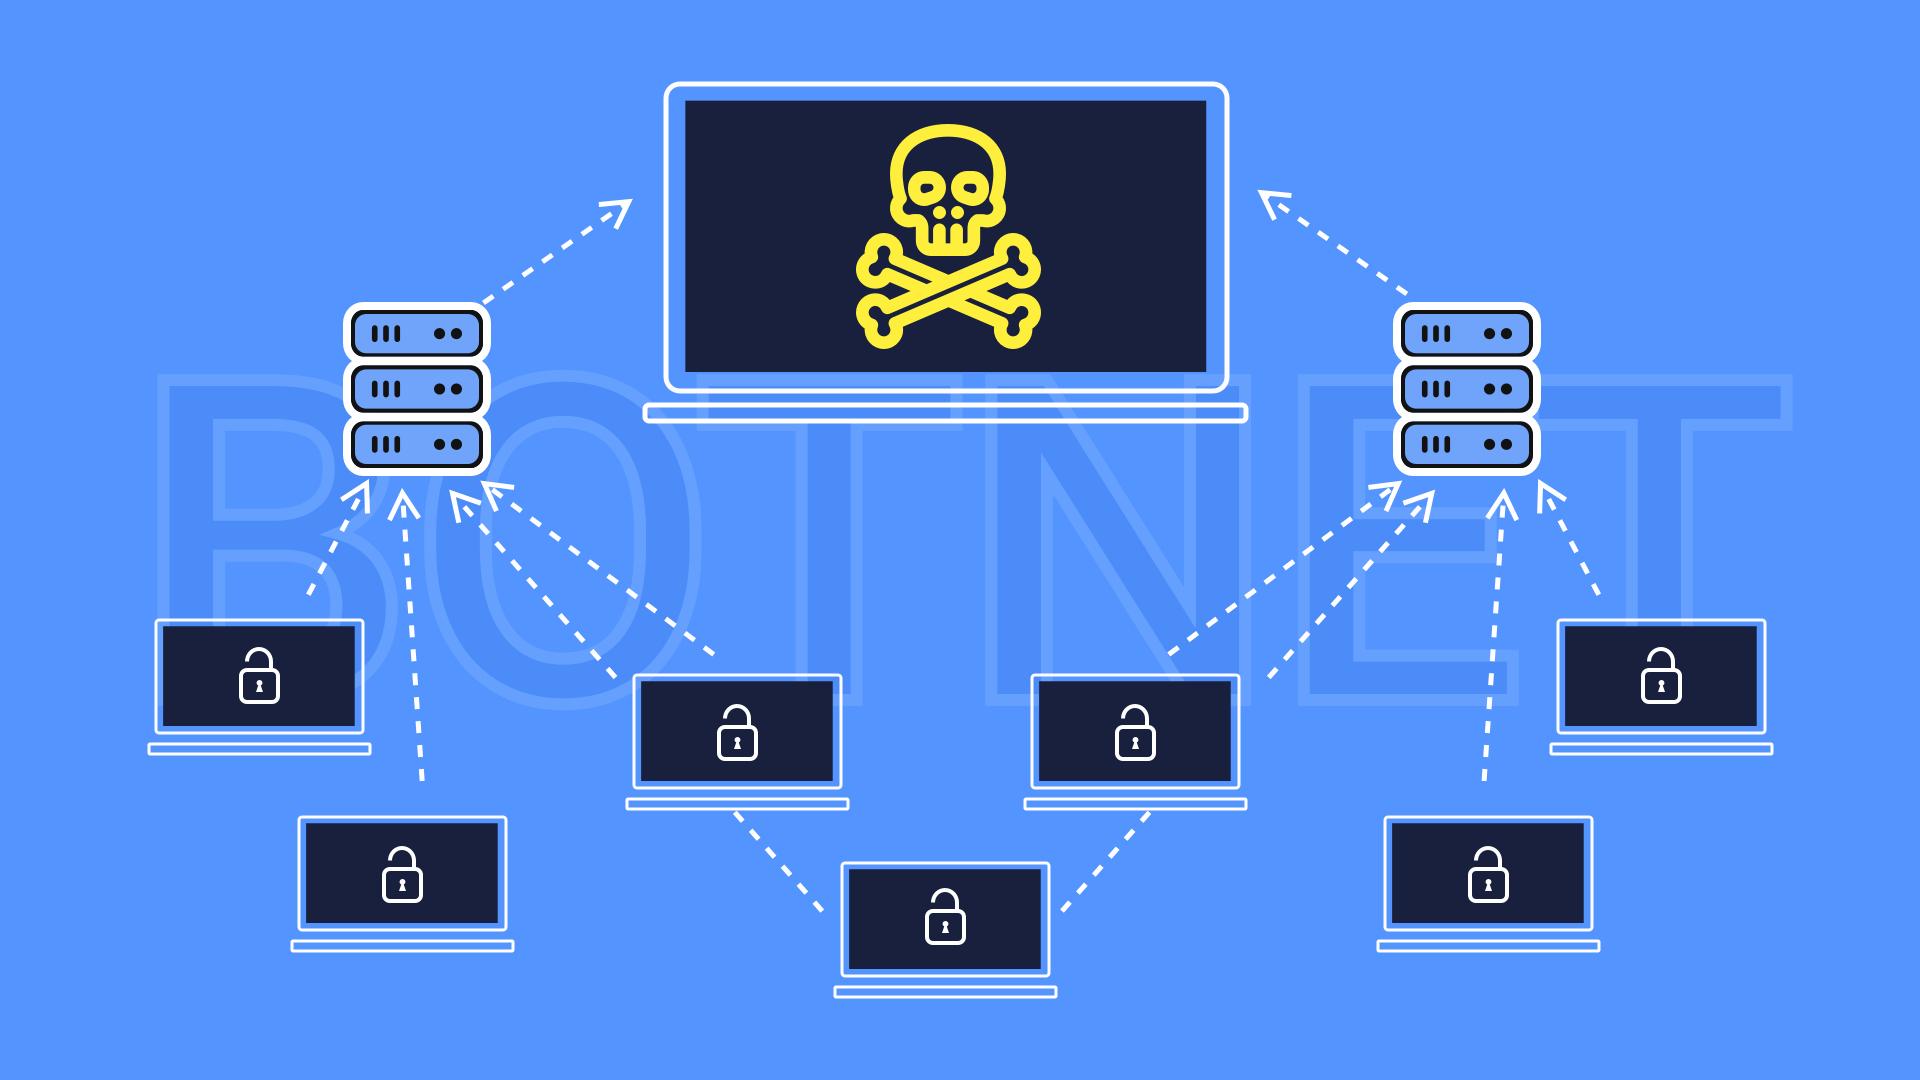 IoT-ботнет Mozi теперь атакует сетевые шлюзы Netgear, Huawei и ZTE